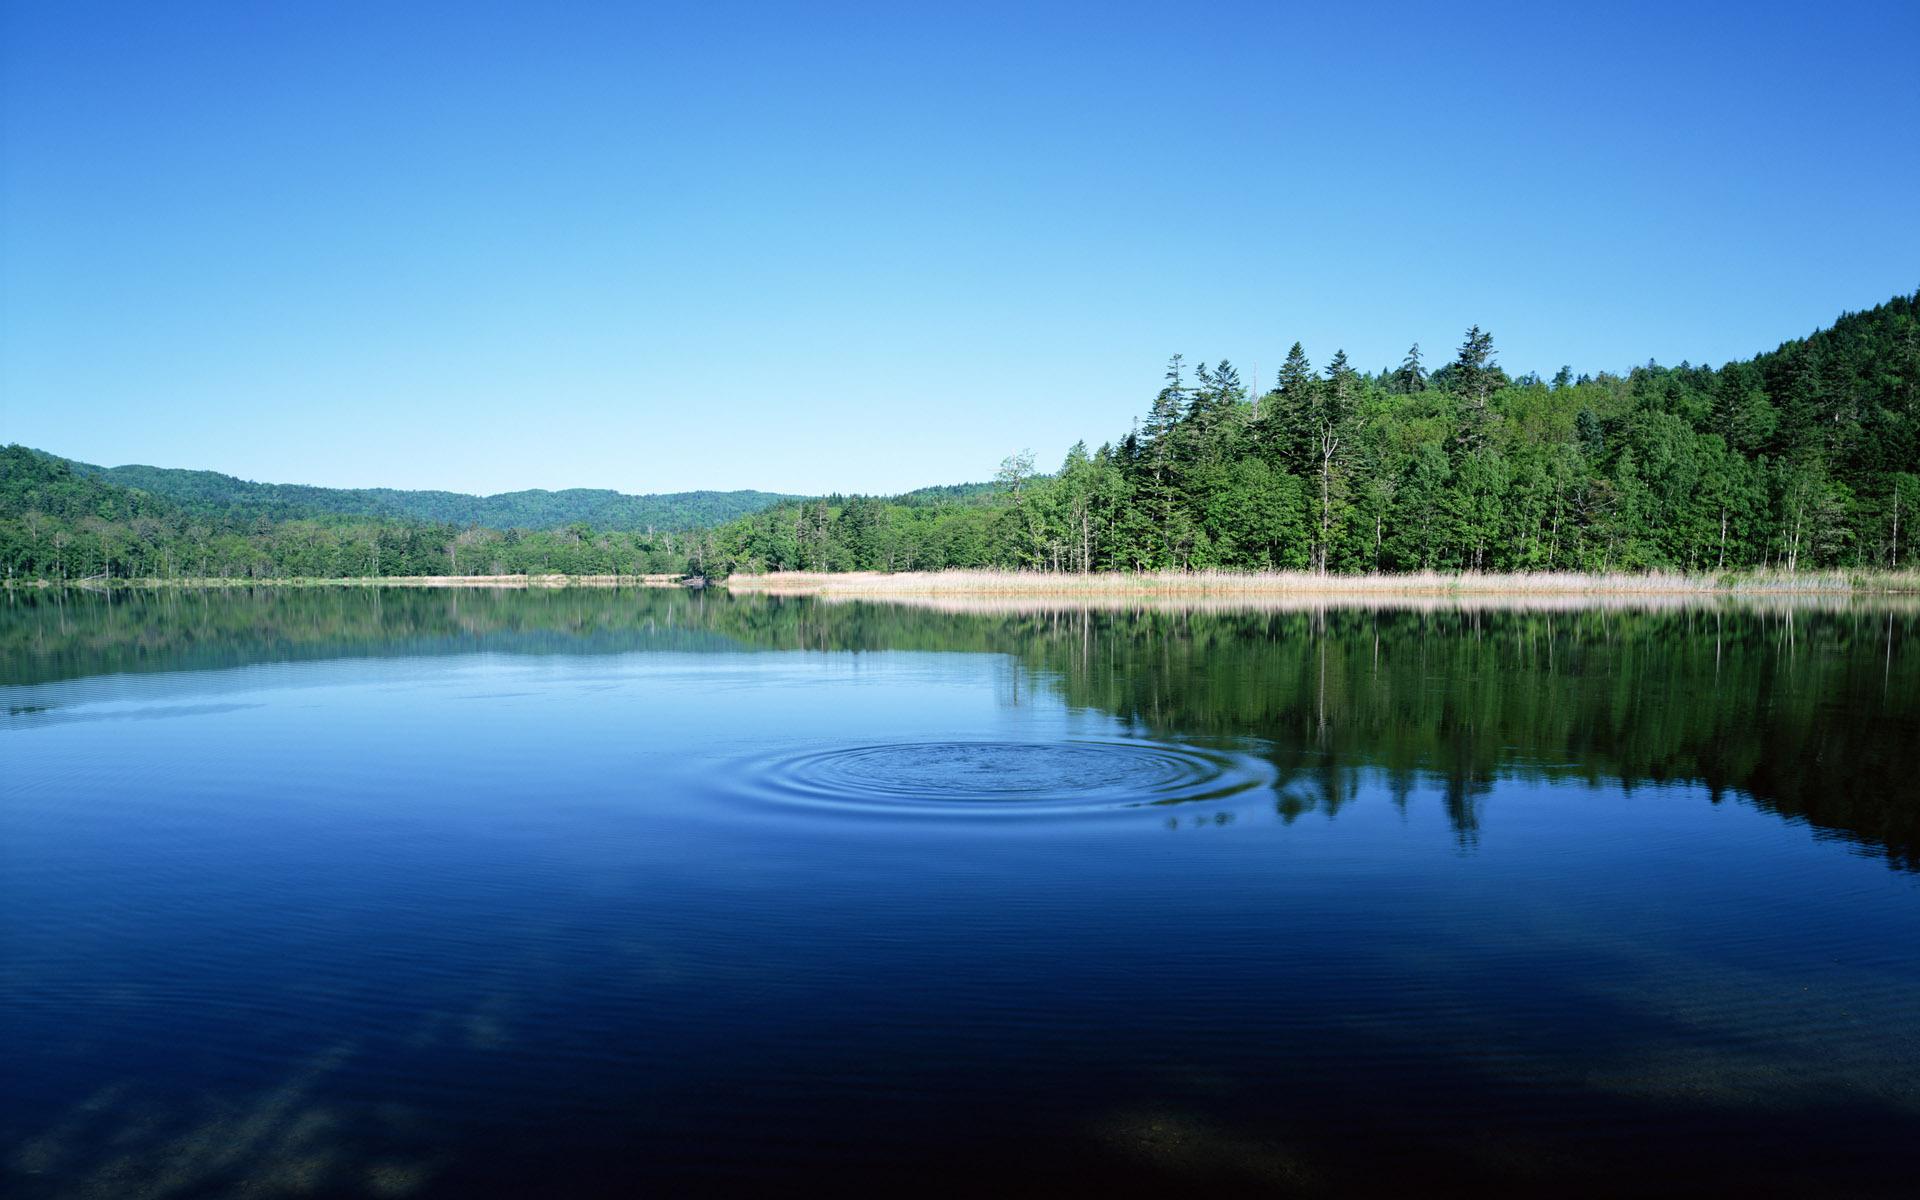 озеро the lake загрузить